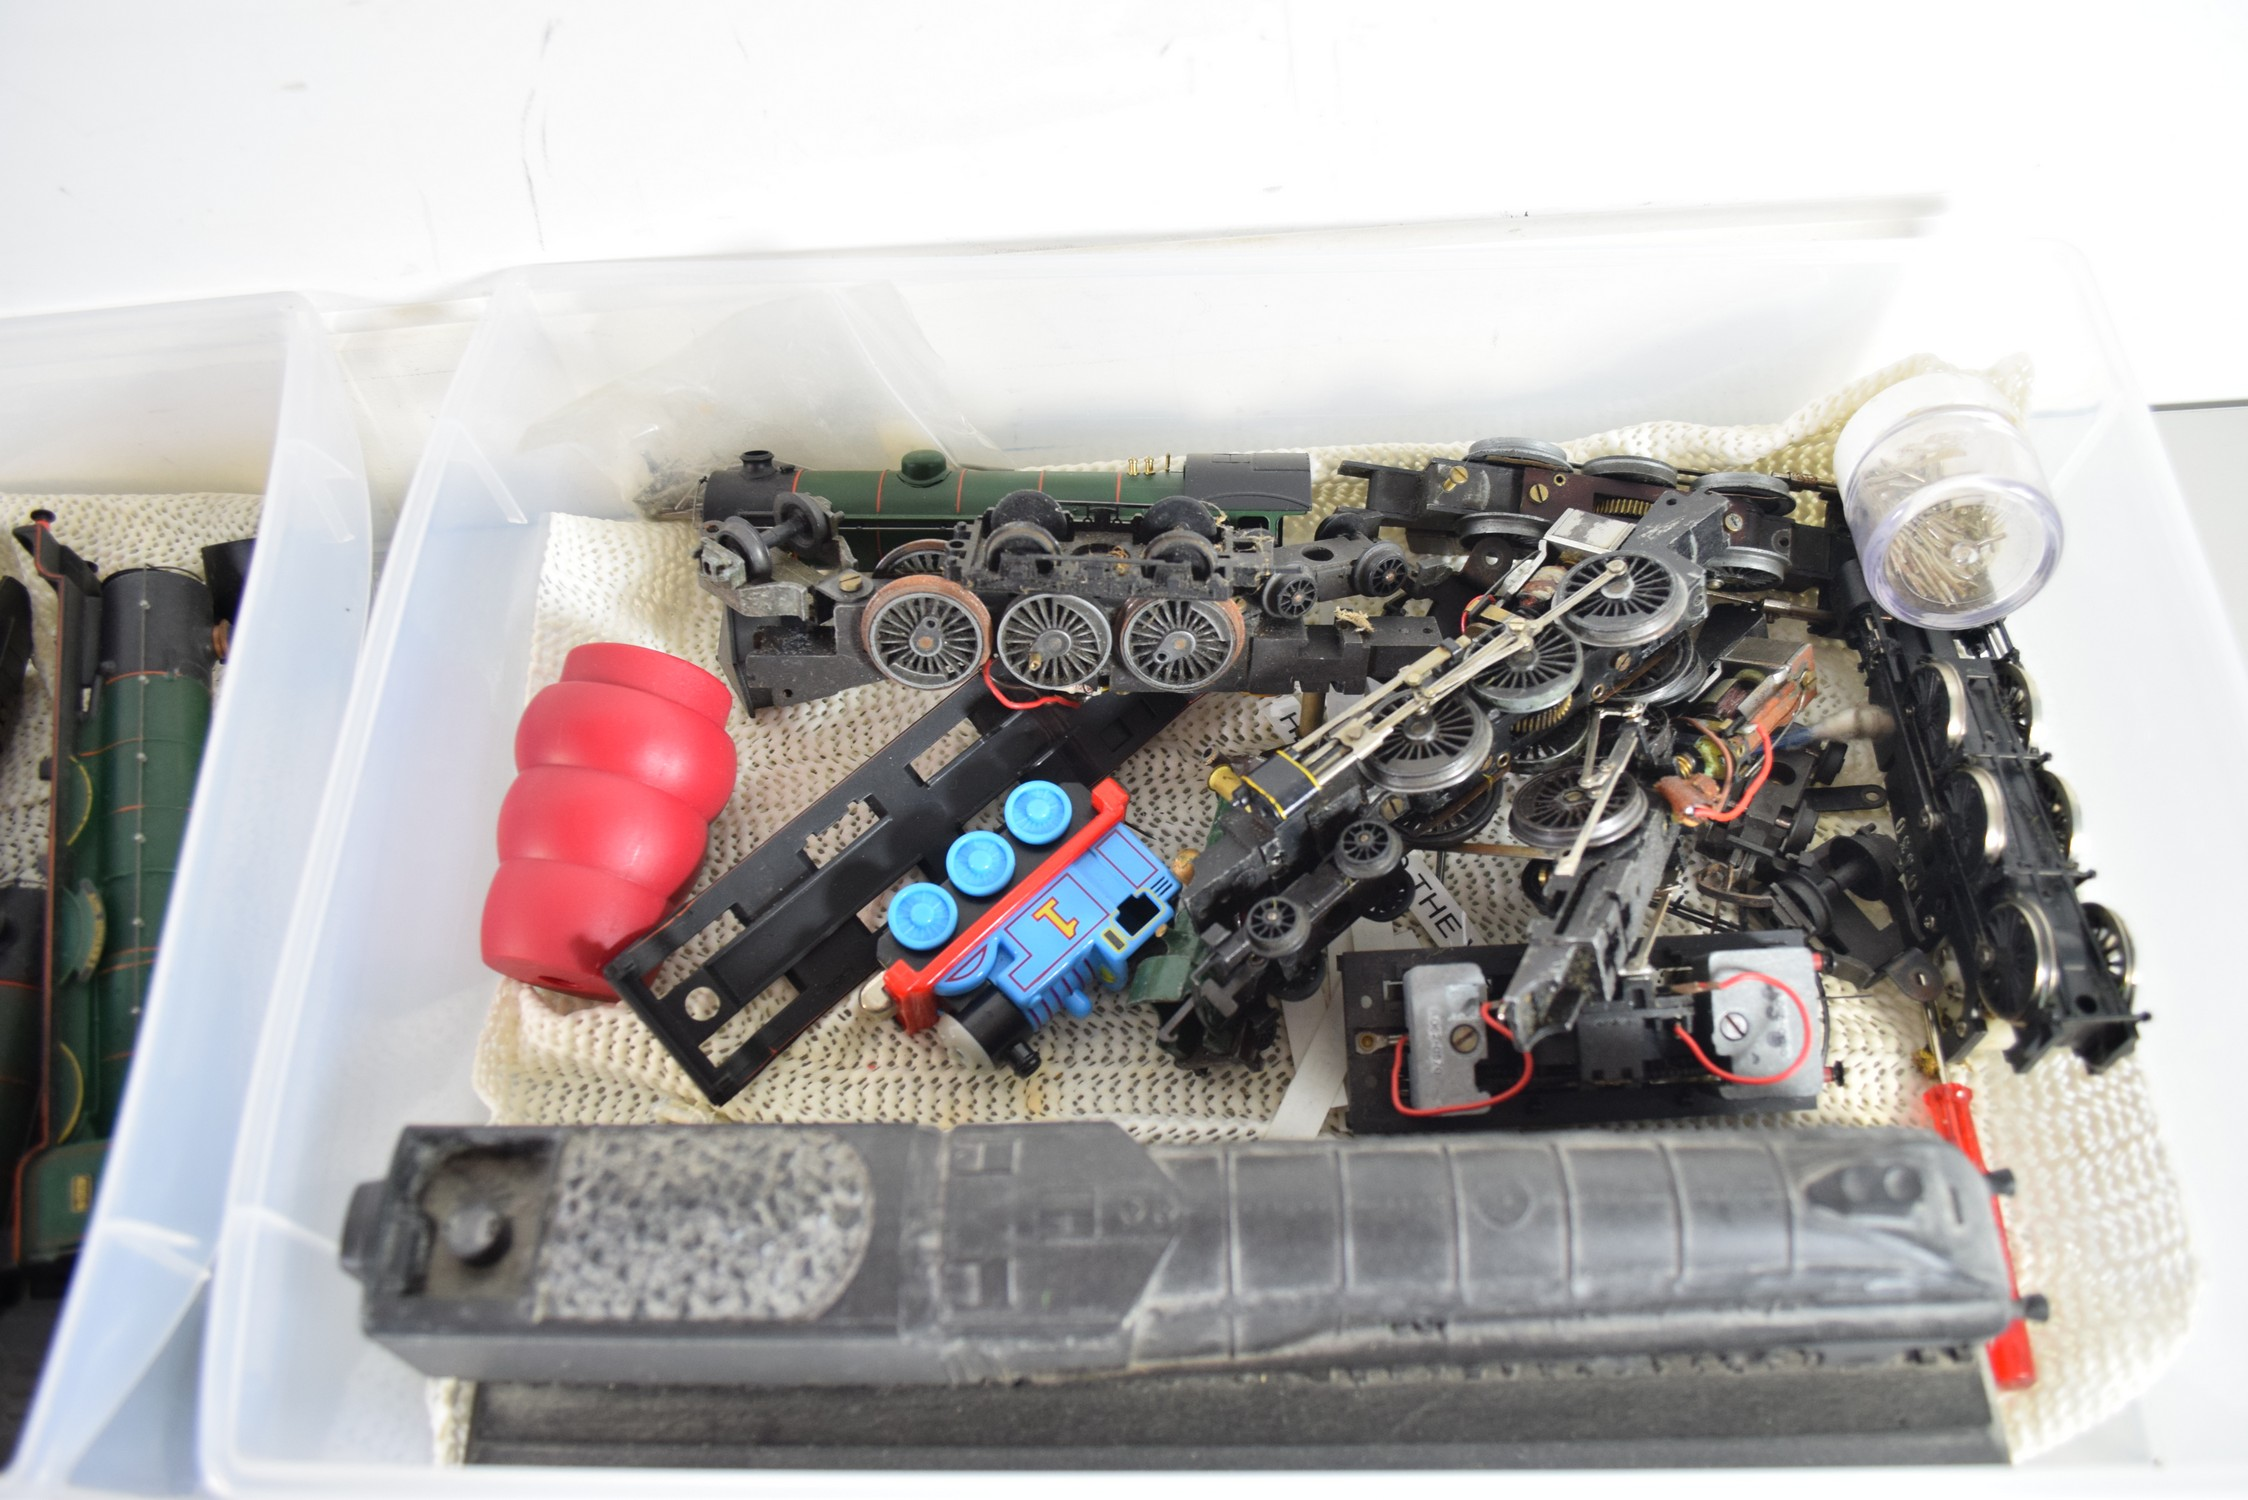 Box containing various model railway scenery accessories, figures etc - Image 2 of 2